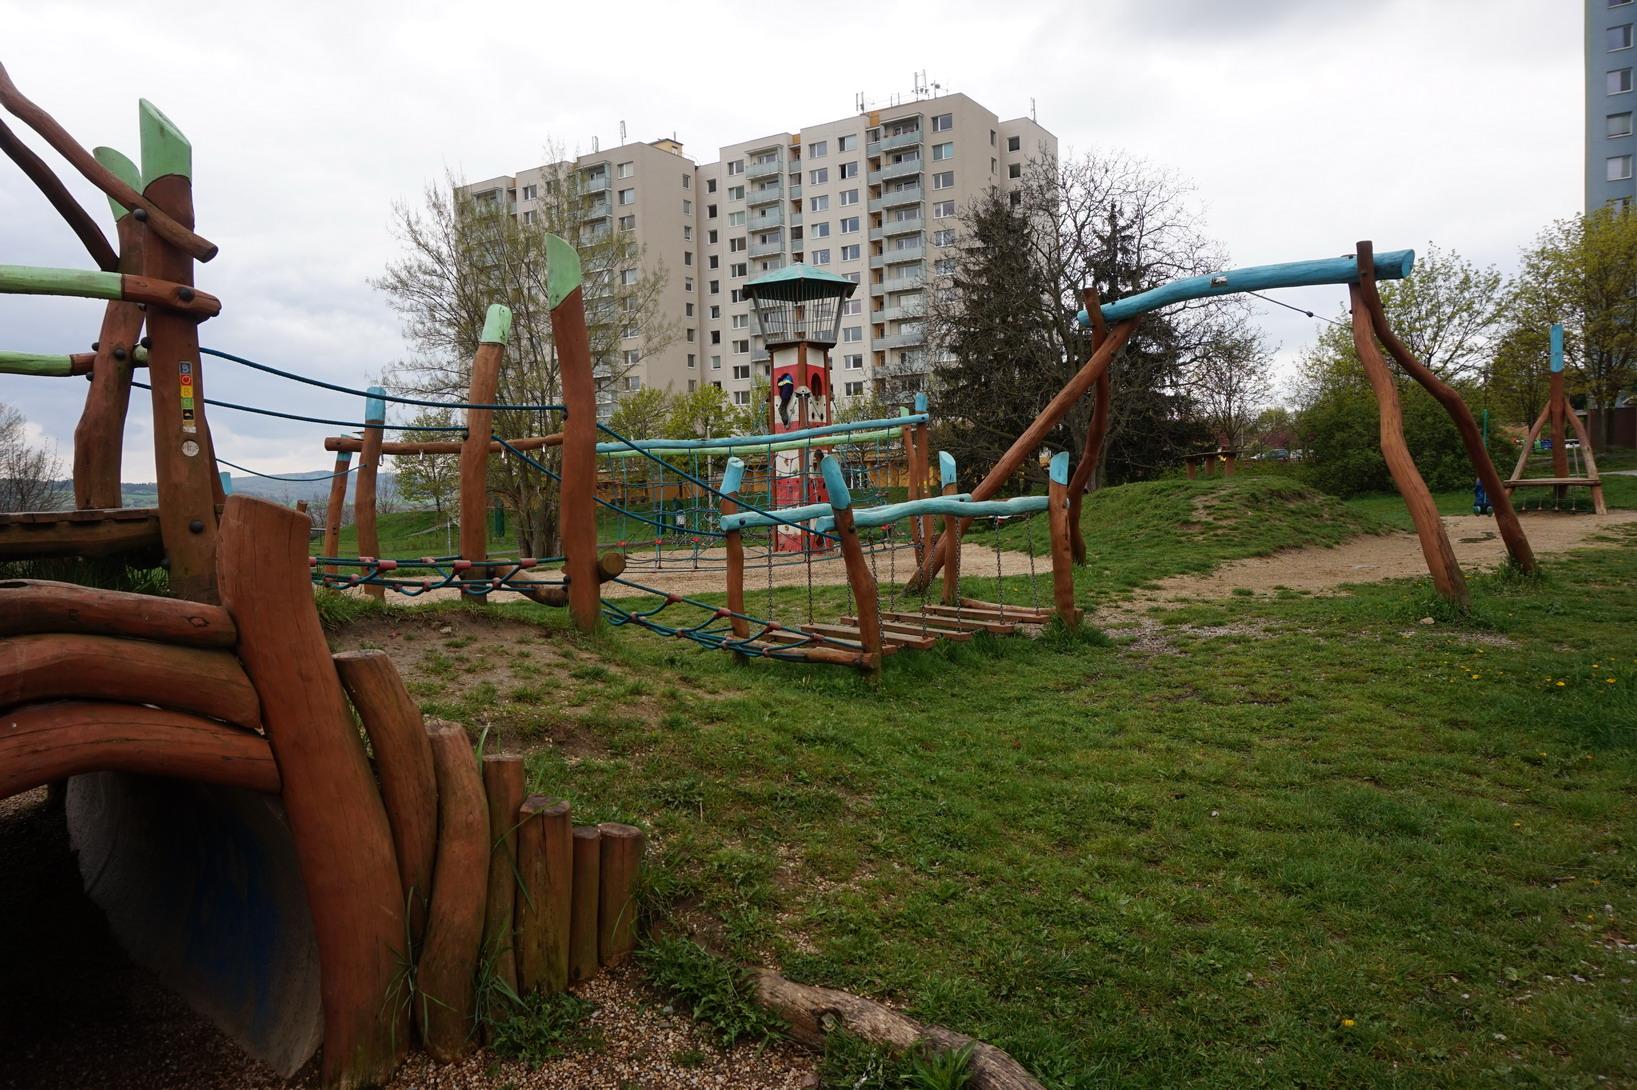 kamenak_1053